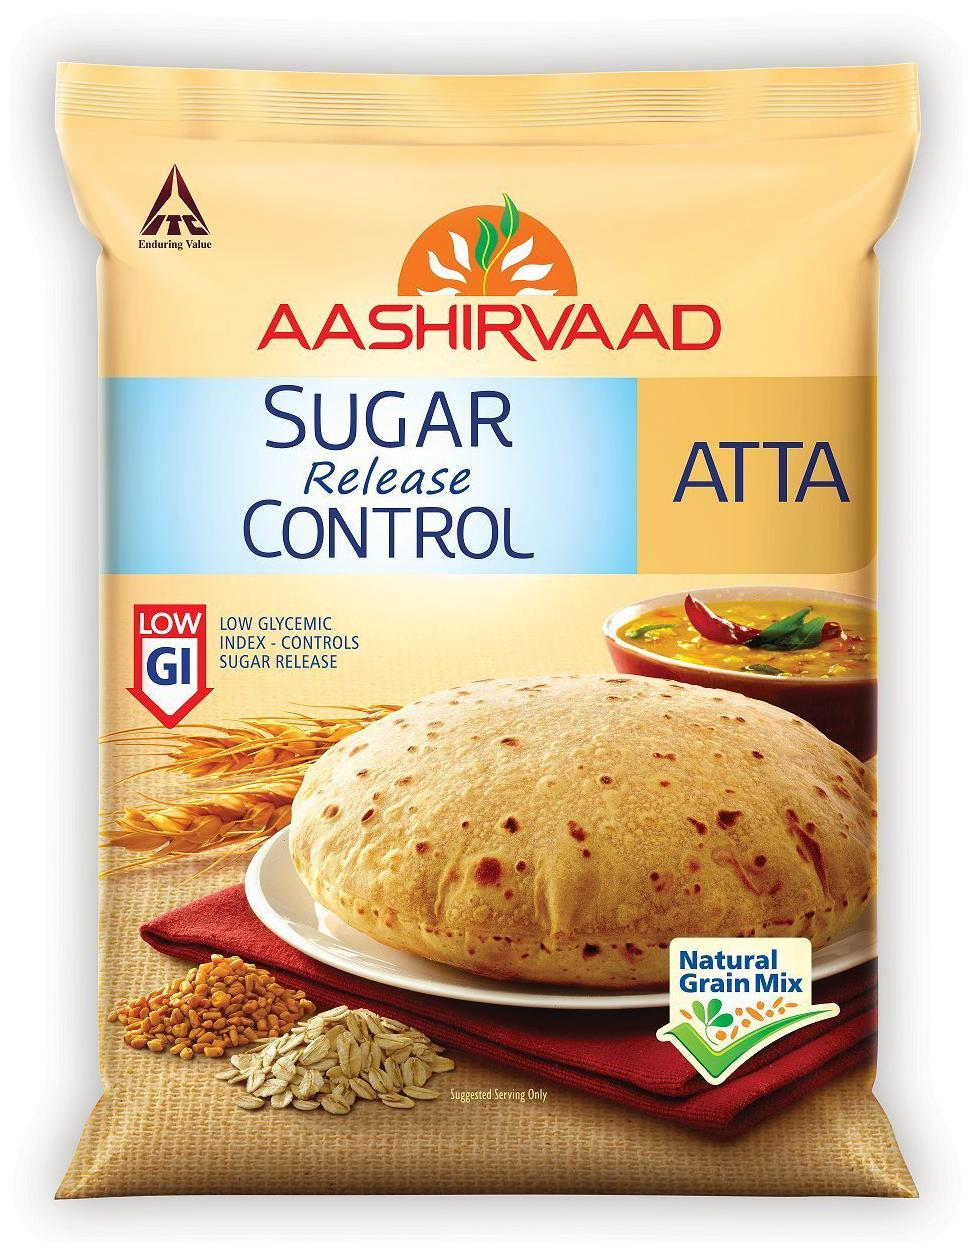 Aashirvaad Atta - Sugar Release Control 5 kg